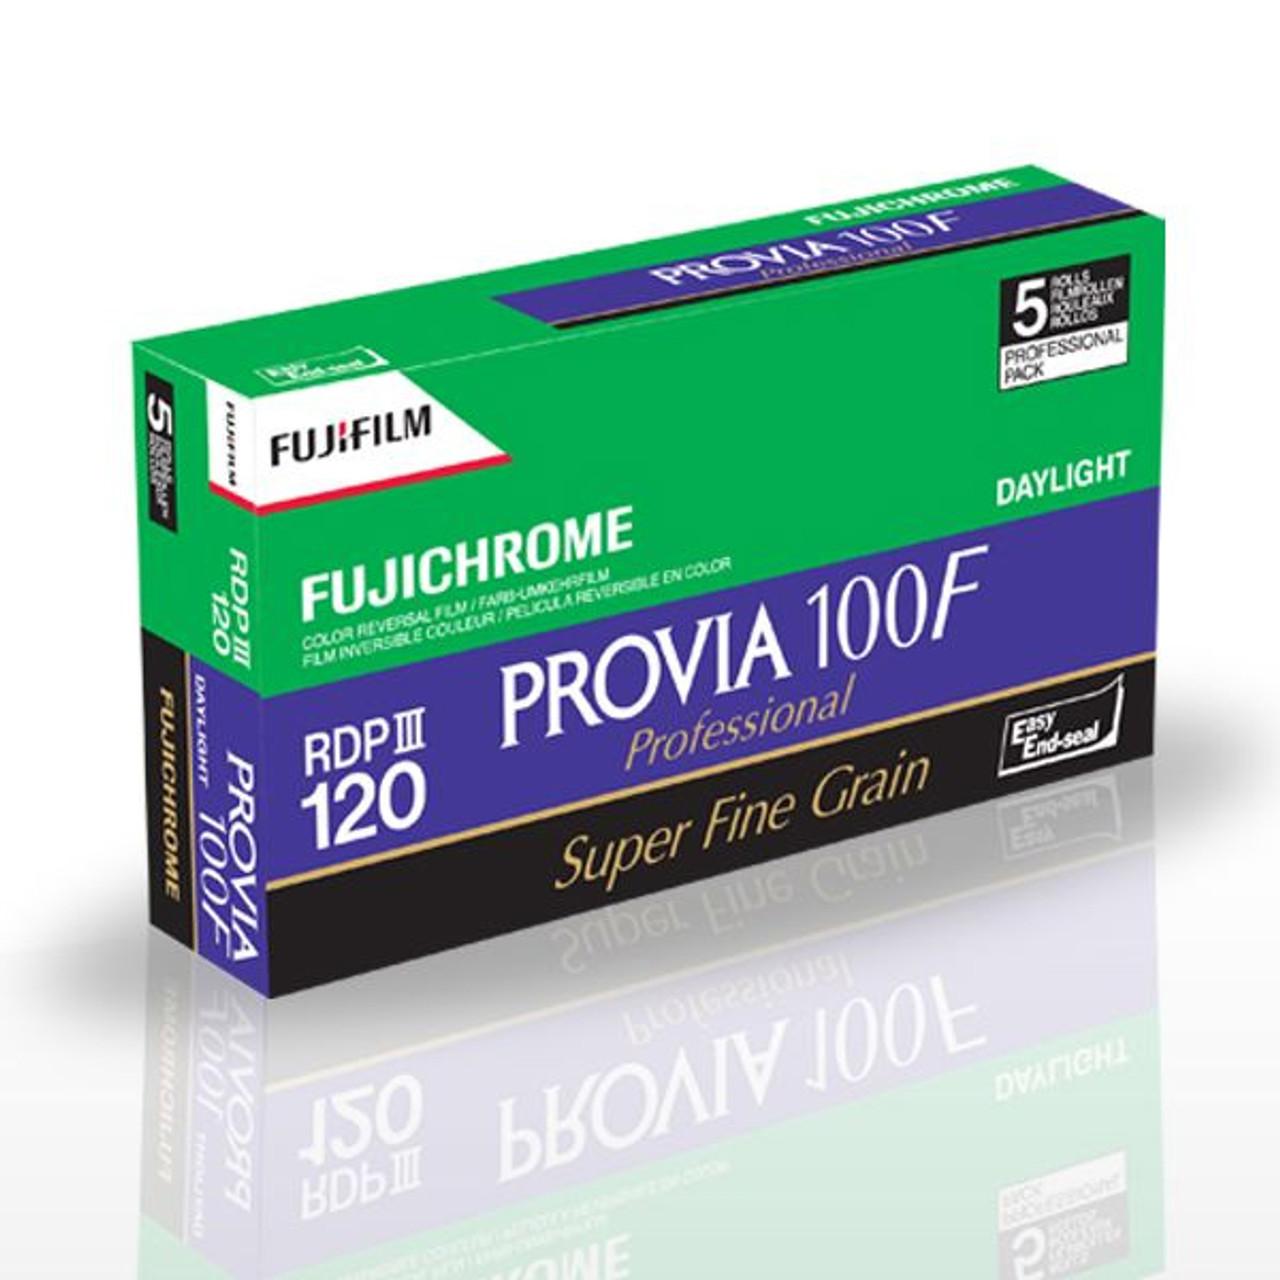 FujiChrome Provia 100F - Daylight 100 ISO Pro Film (B4) (120 - Pro Pack, 5 rolls)